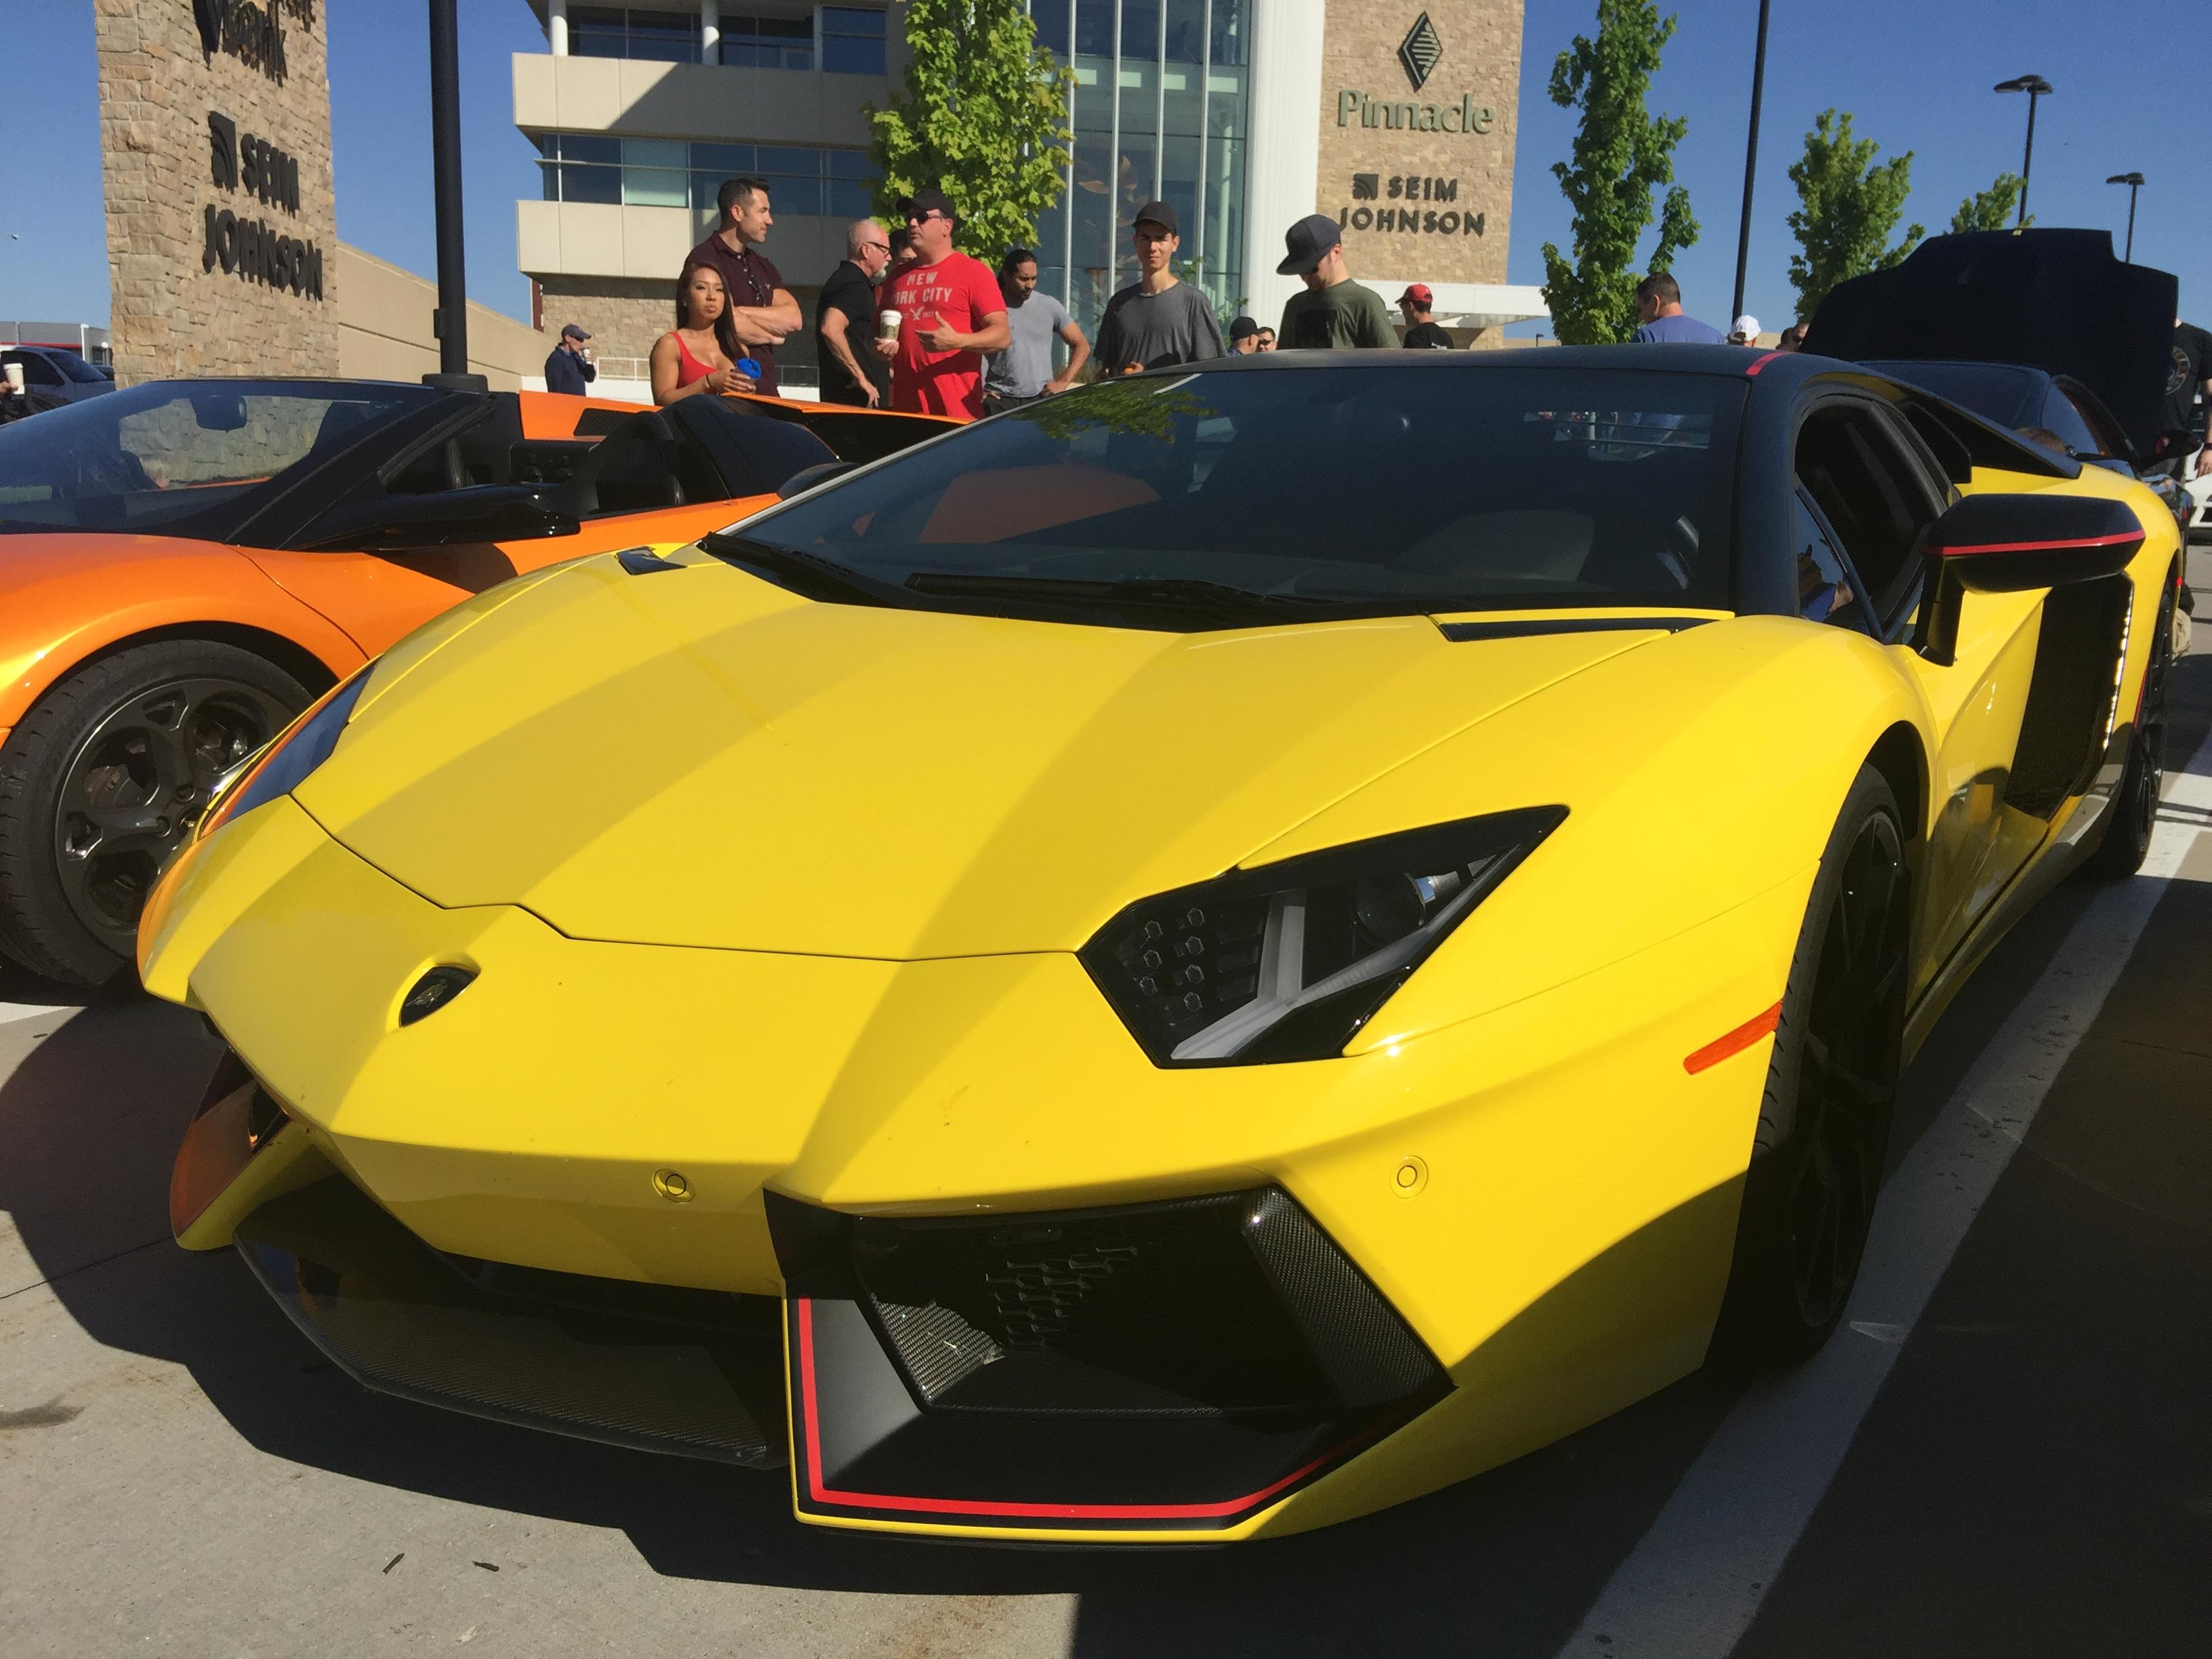 West Omaha Euros Exotics Car Show S Line Motorsports LLC - Omaha car show